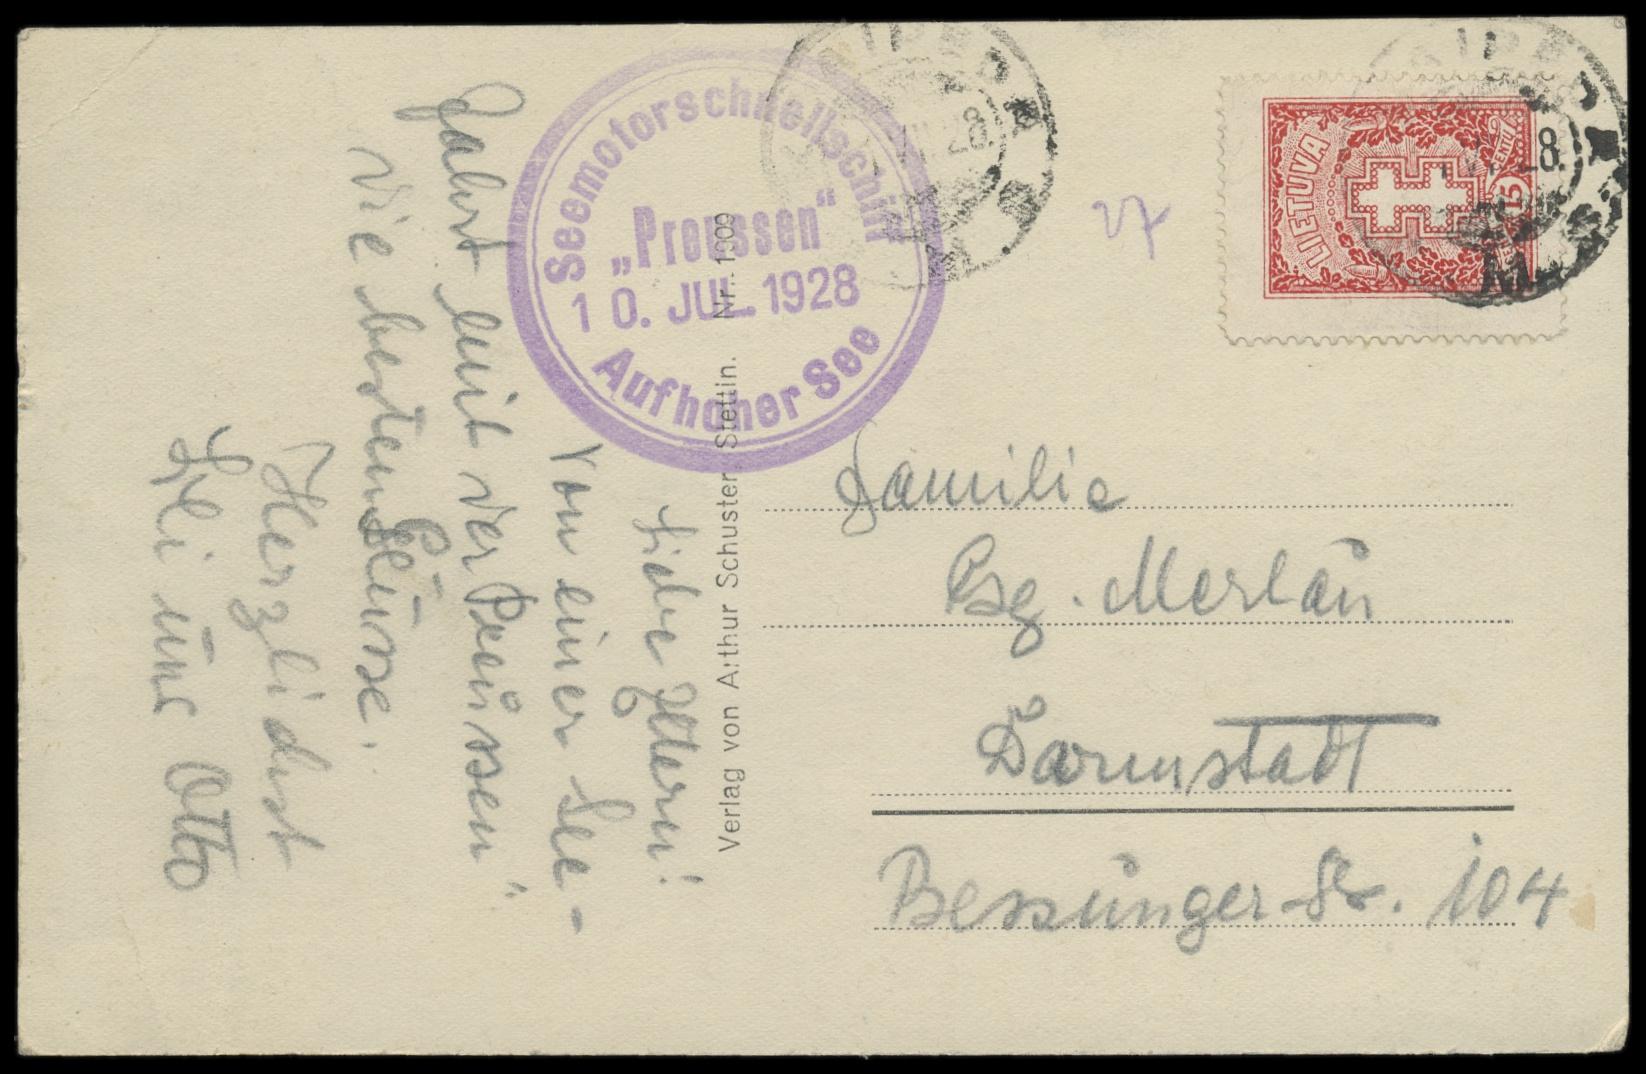 Lot 2435 - Main catalogue Memel -  Peter Harlos Auctions 42. Harlos Auktion